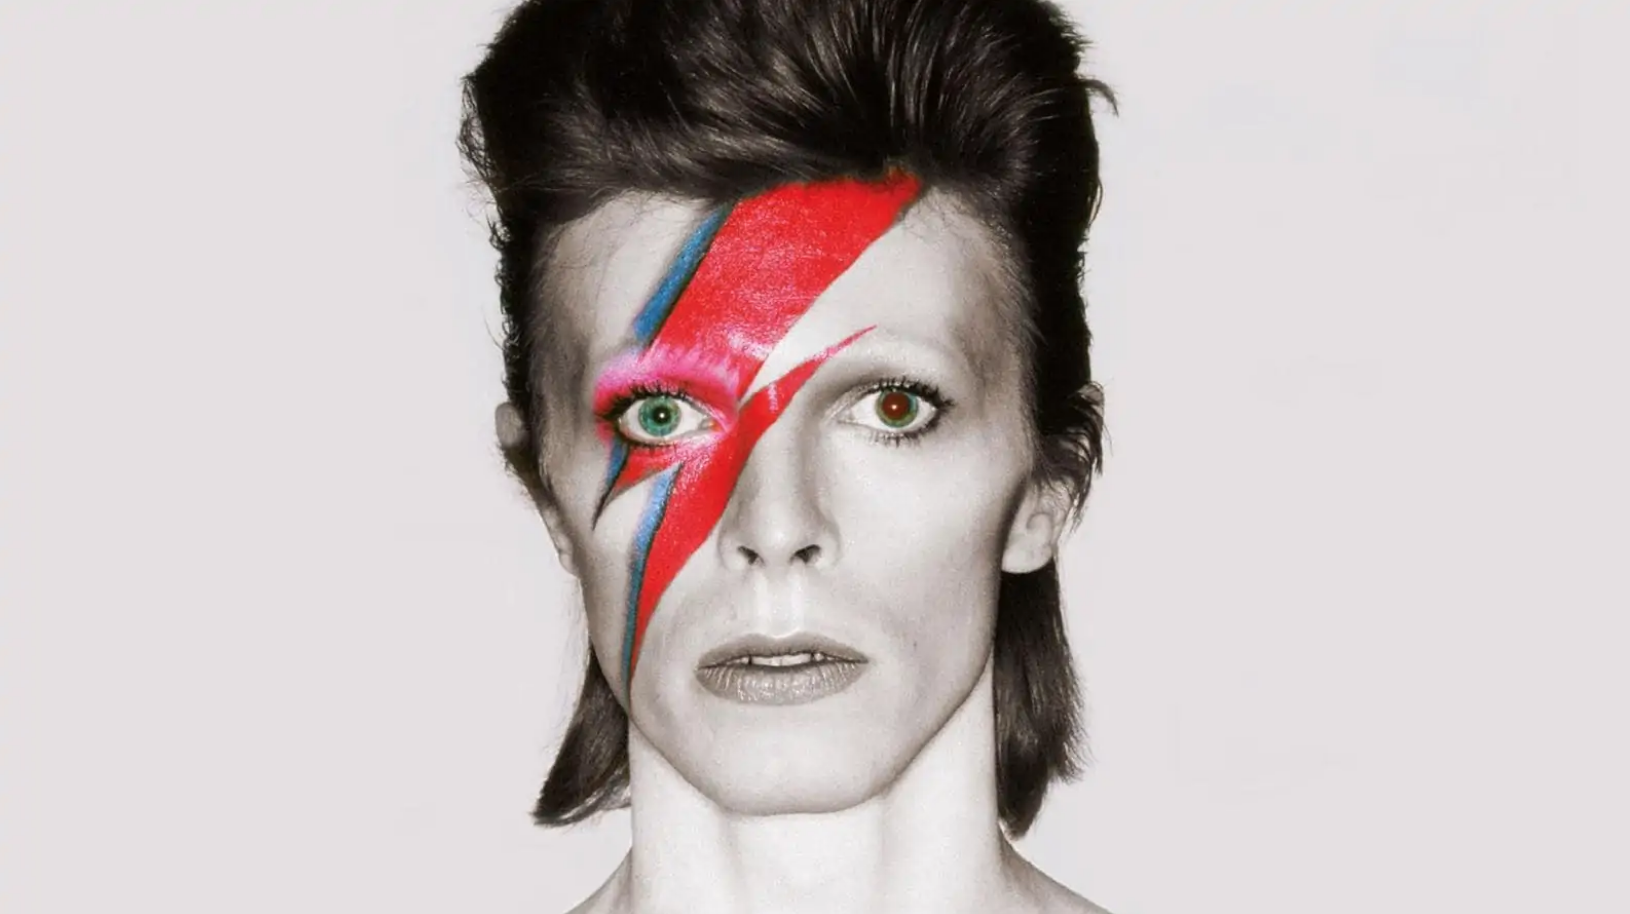 David Bowie da record. Un suo dipinto pagato 3 euro venduto all'asta a 73.500